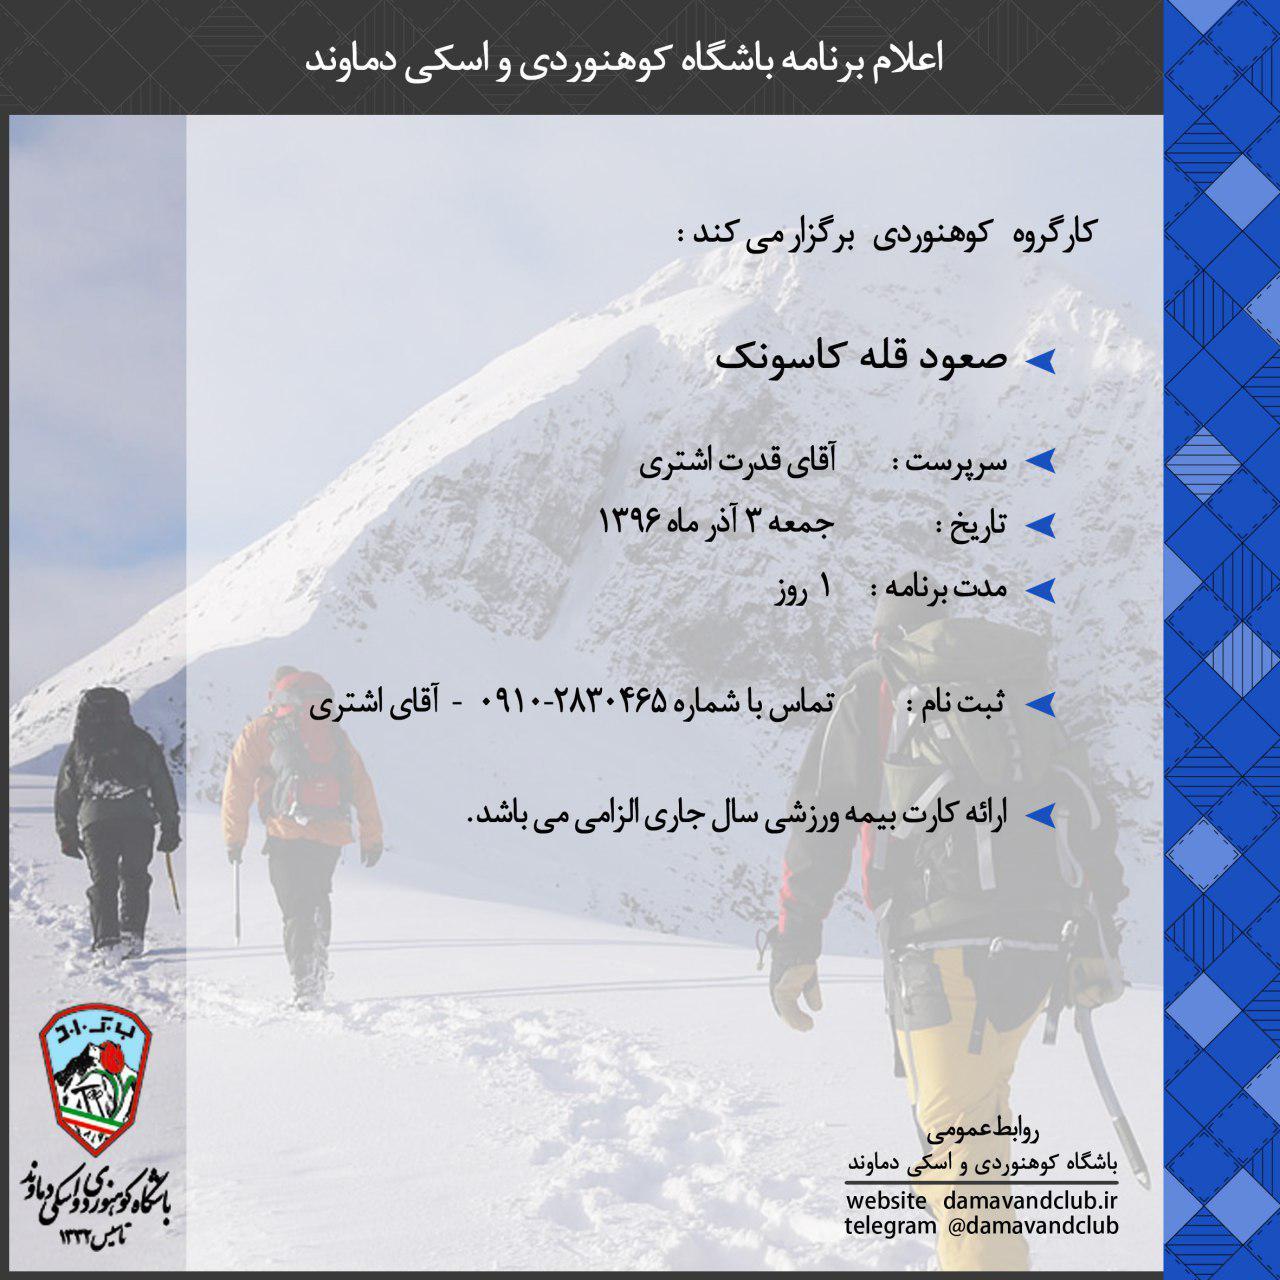 صعود قله کاسونک ۳ آذر ۹۶